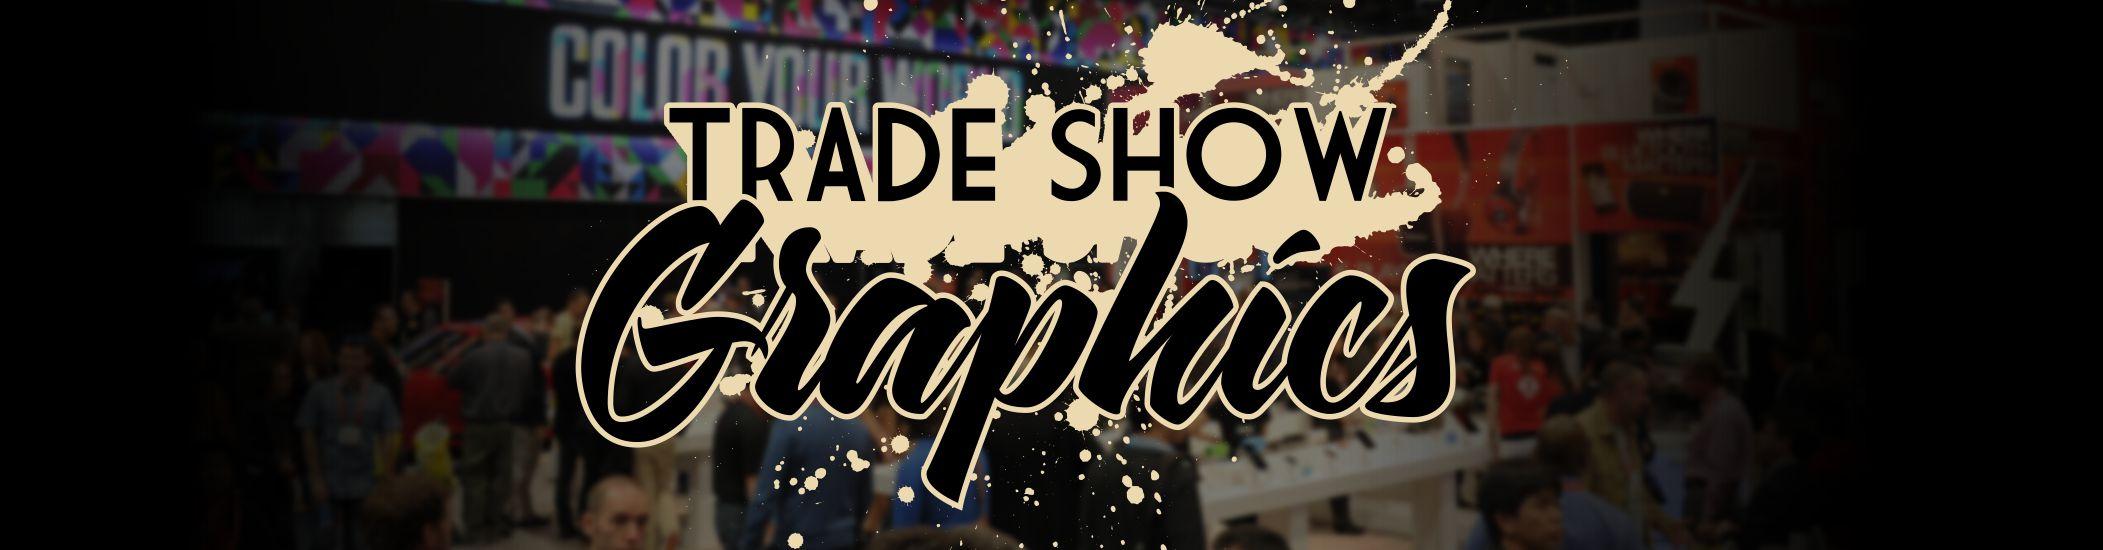 signco-trade-show-header